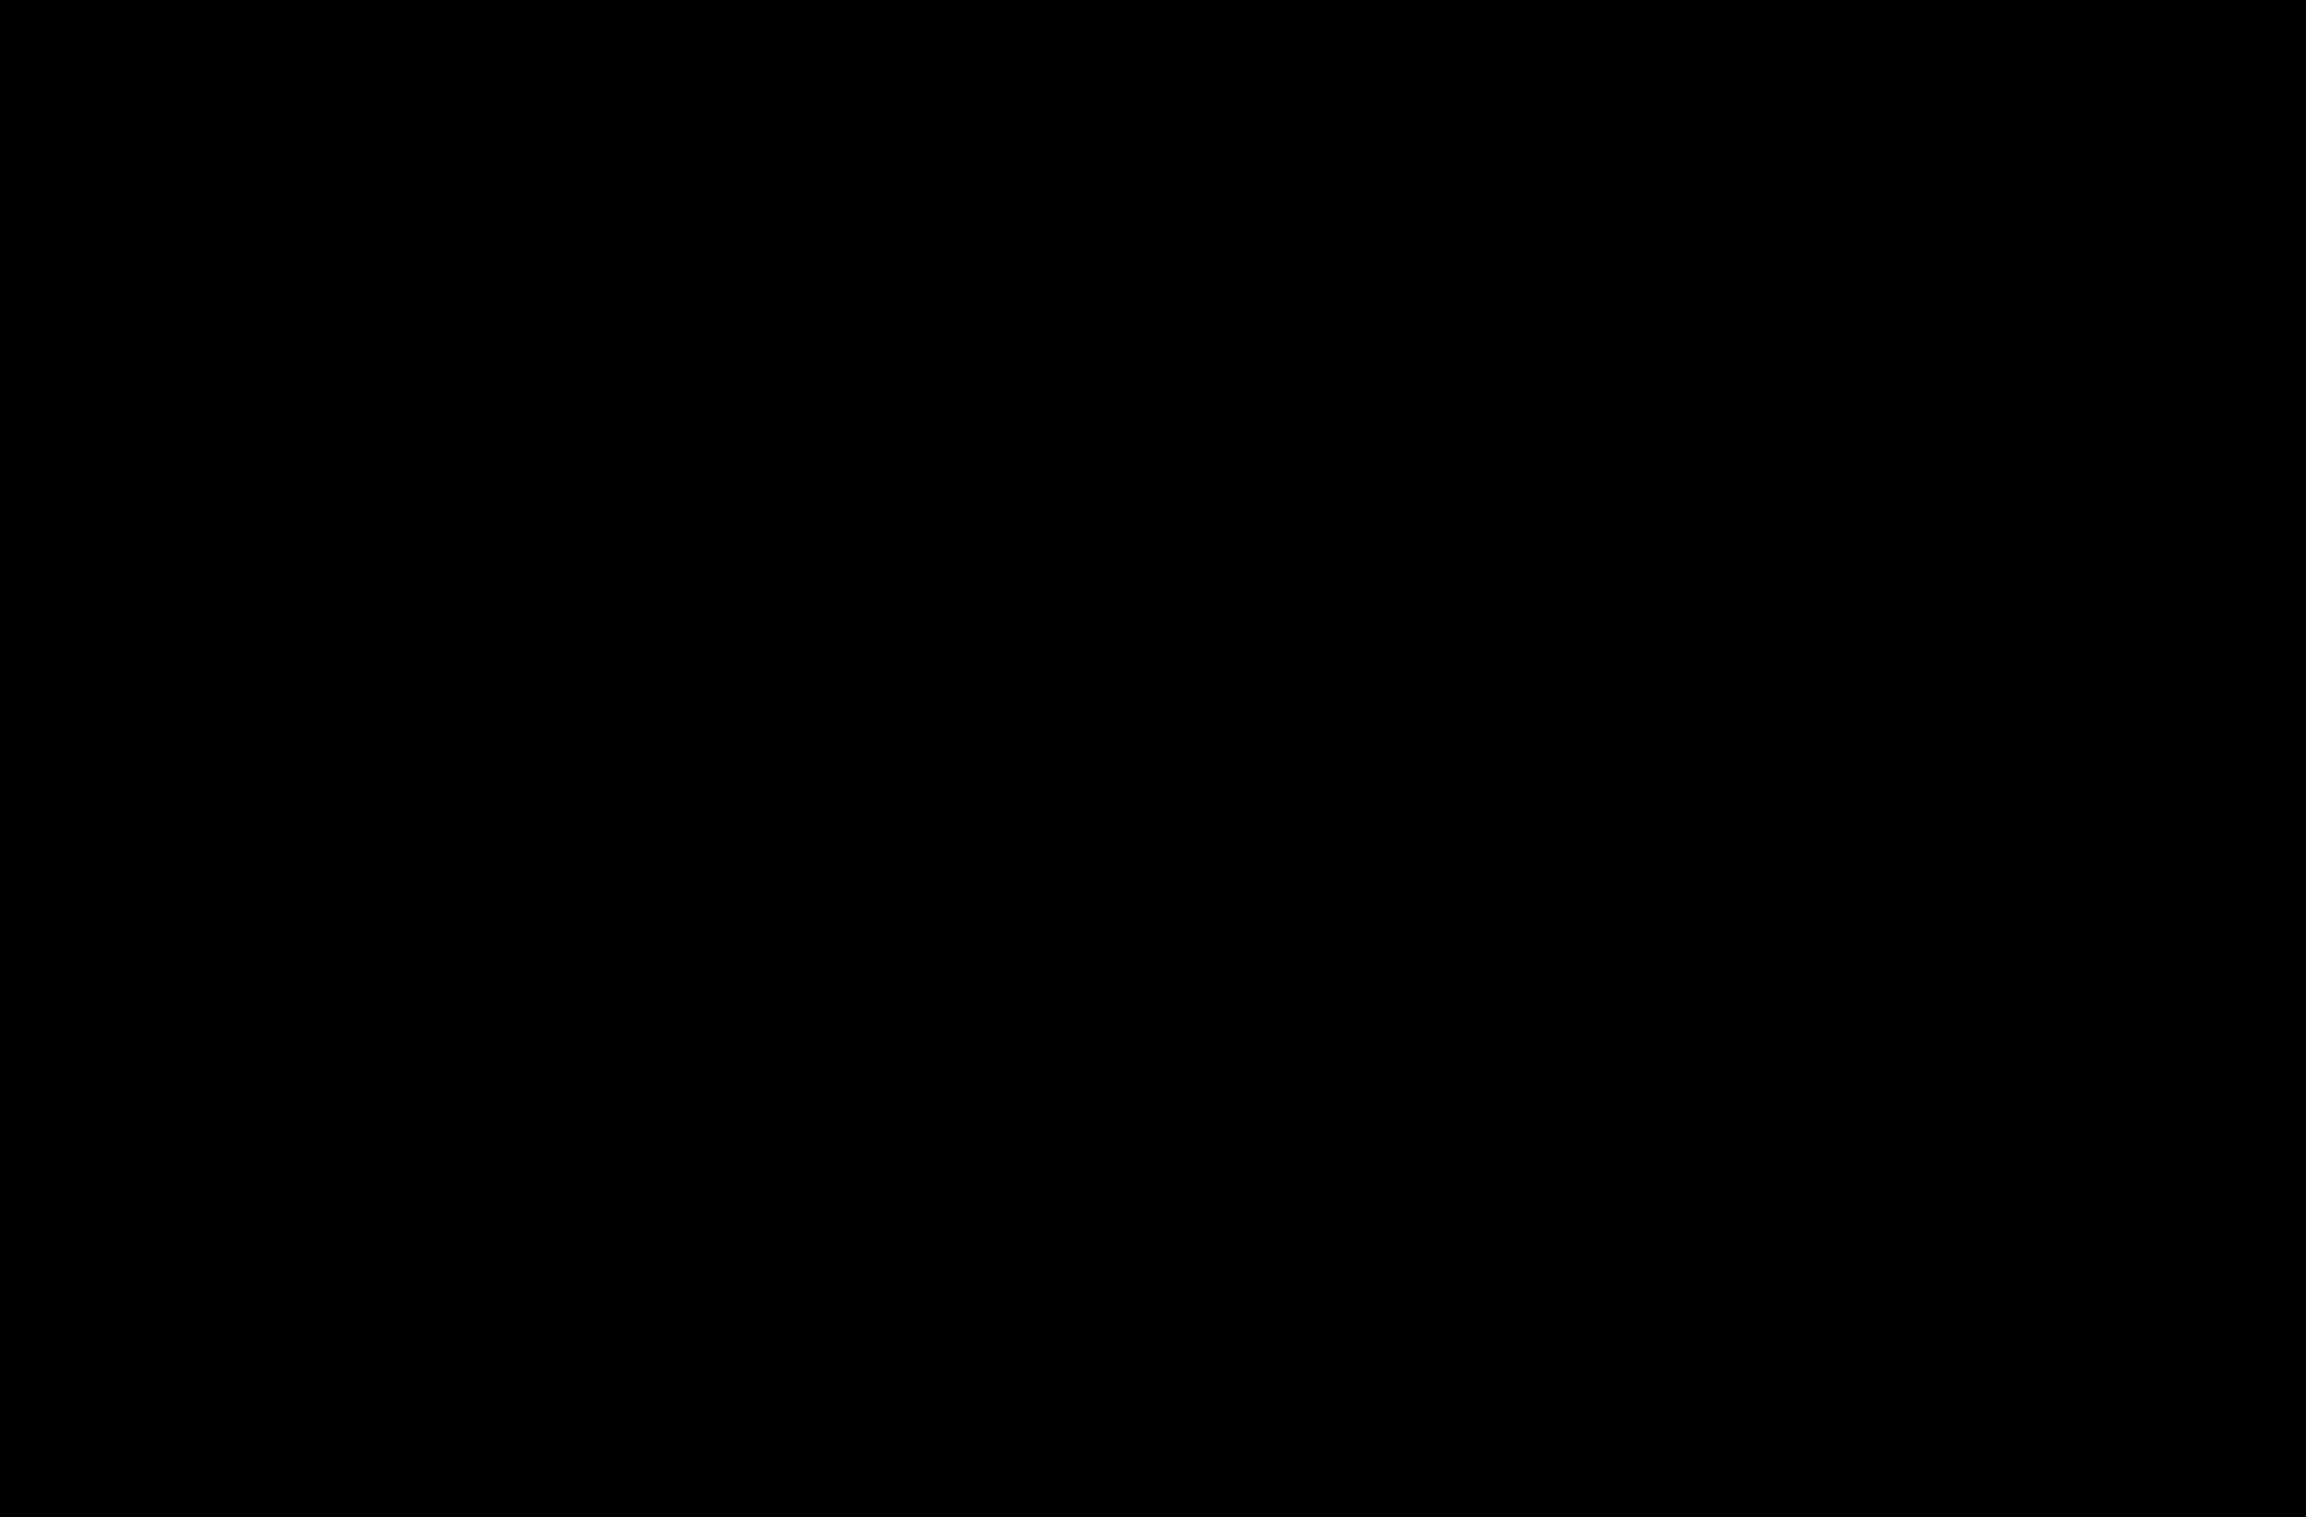 2306x1517 Clipart